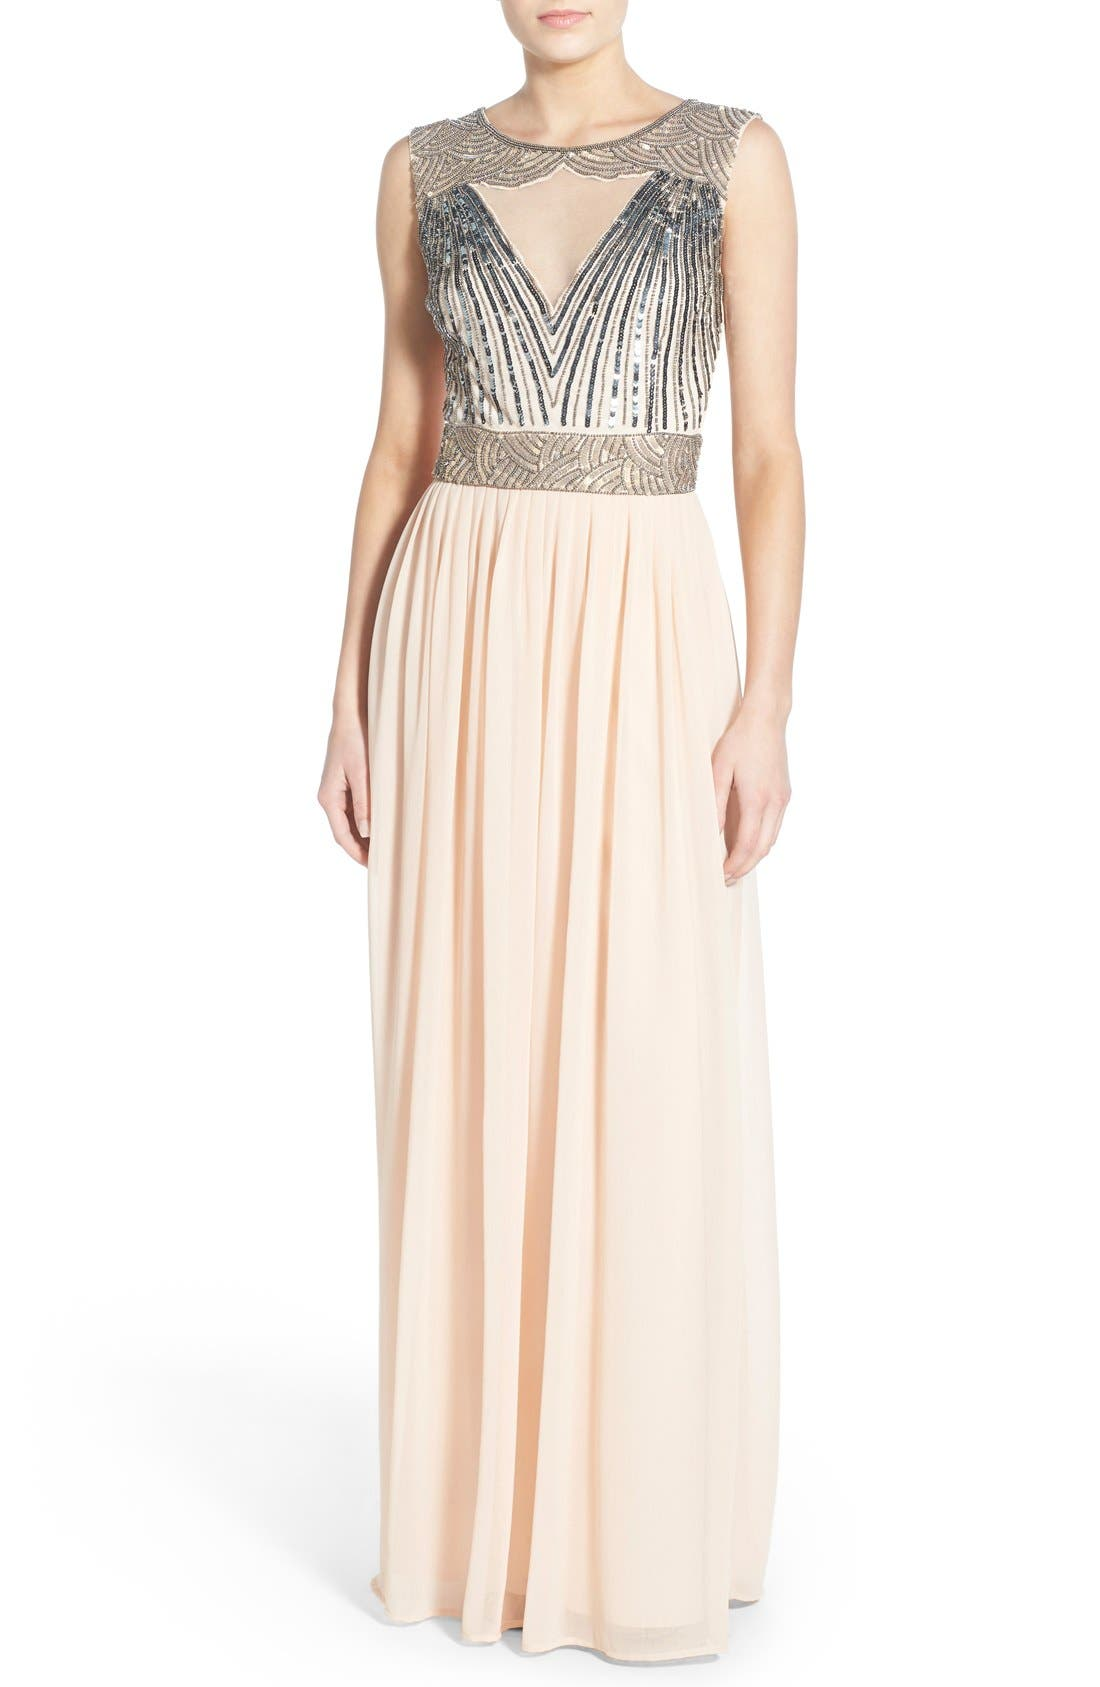 Main Image - Lace & Beads 'Tina' Embellished Maxi Dress